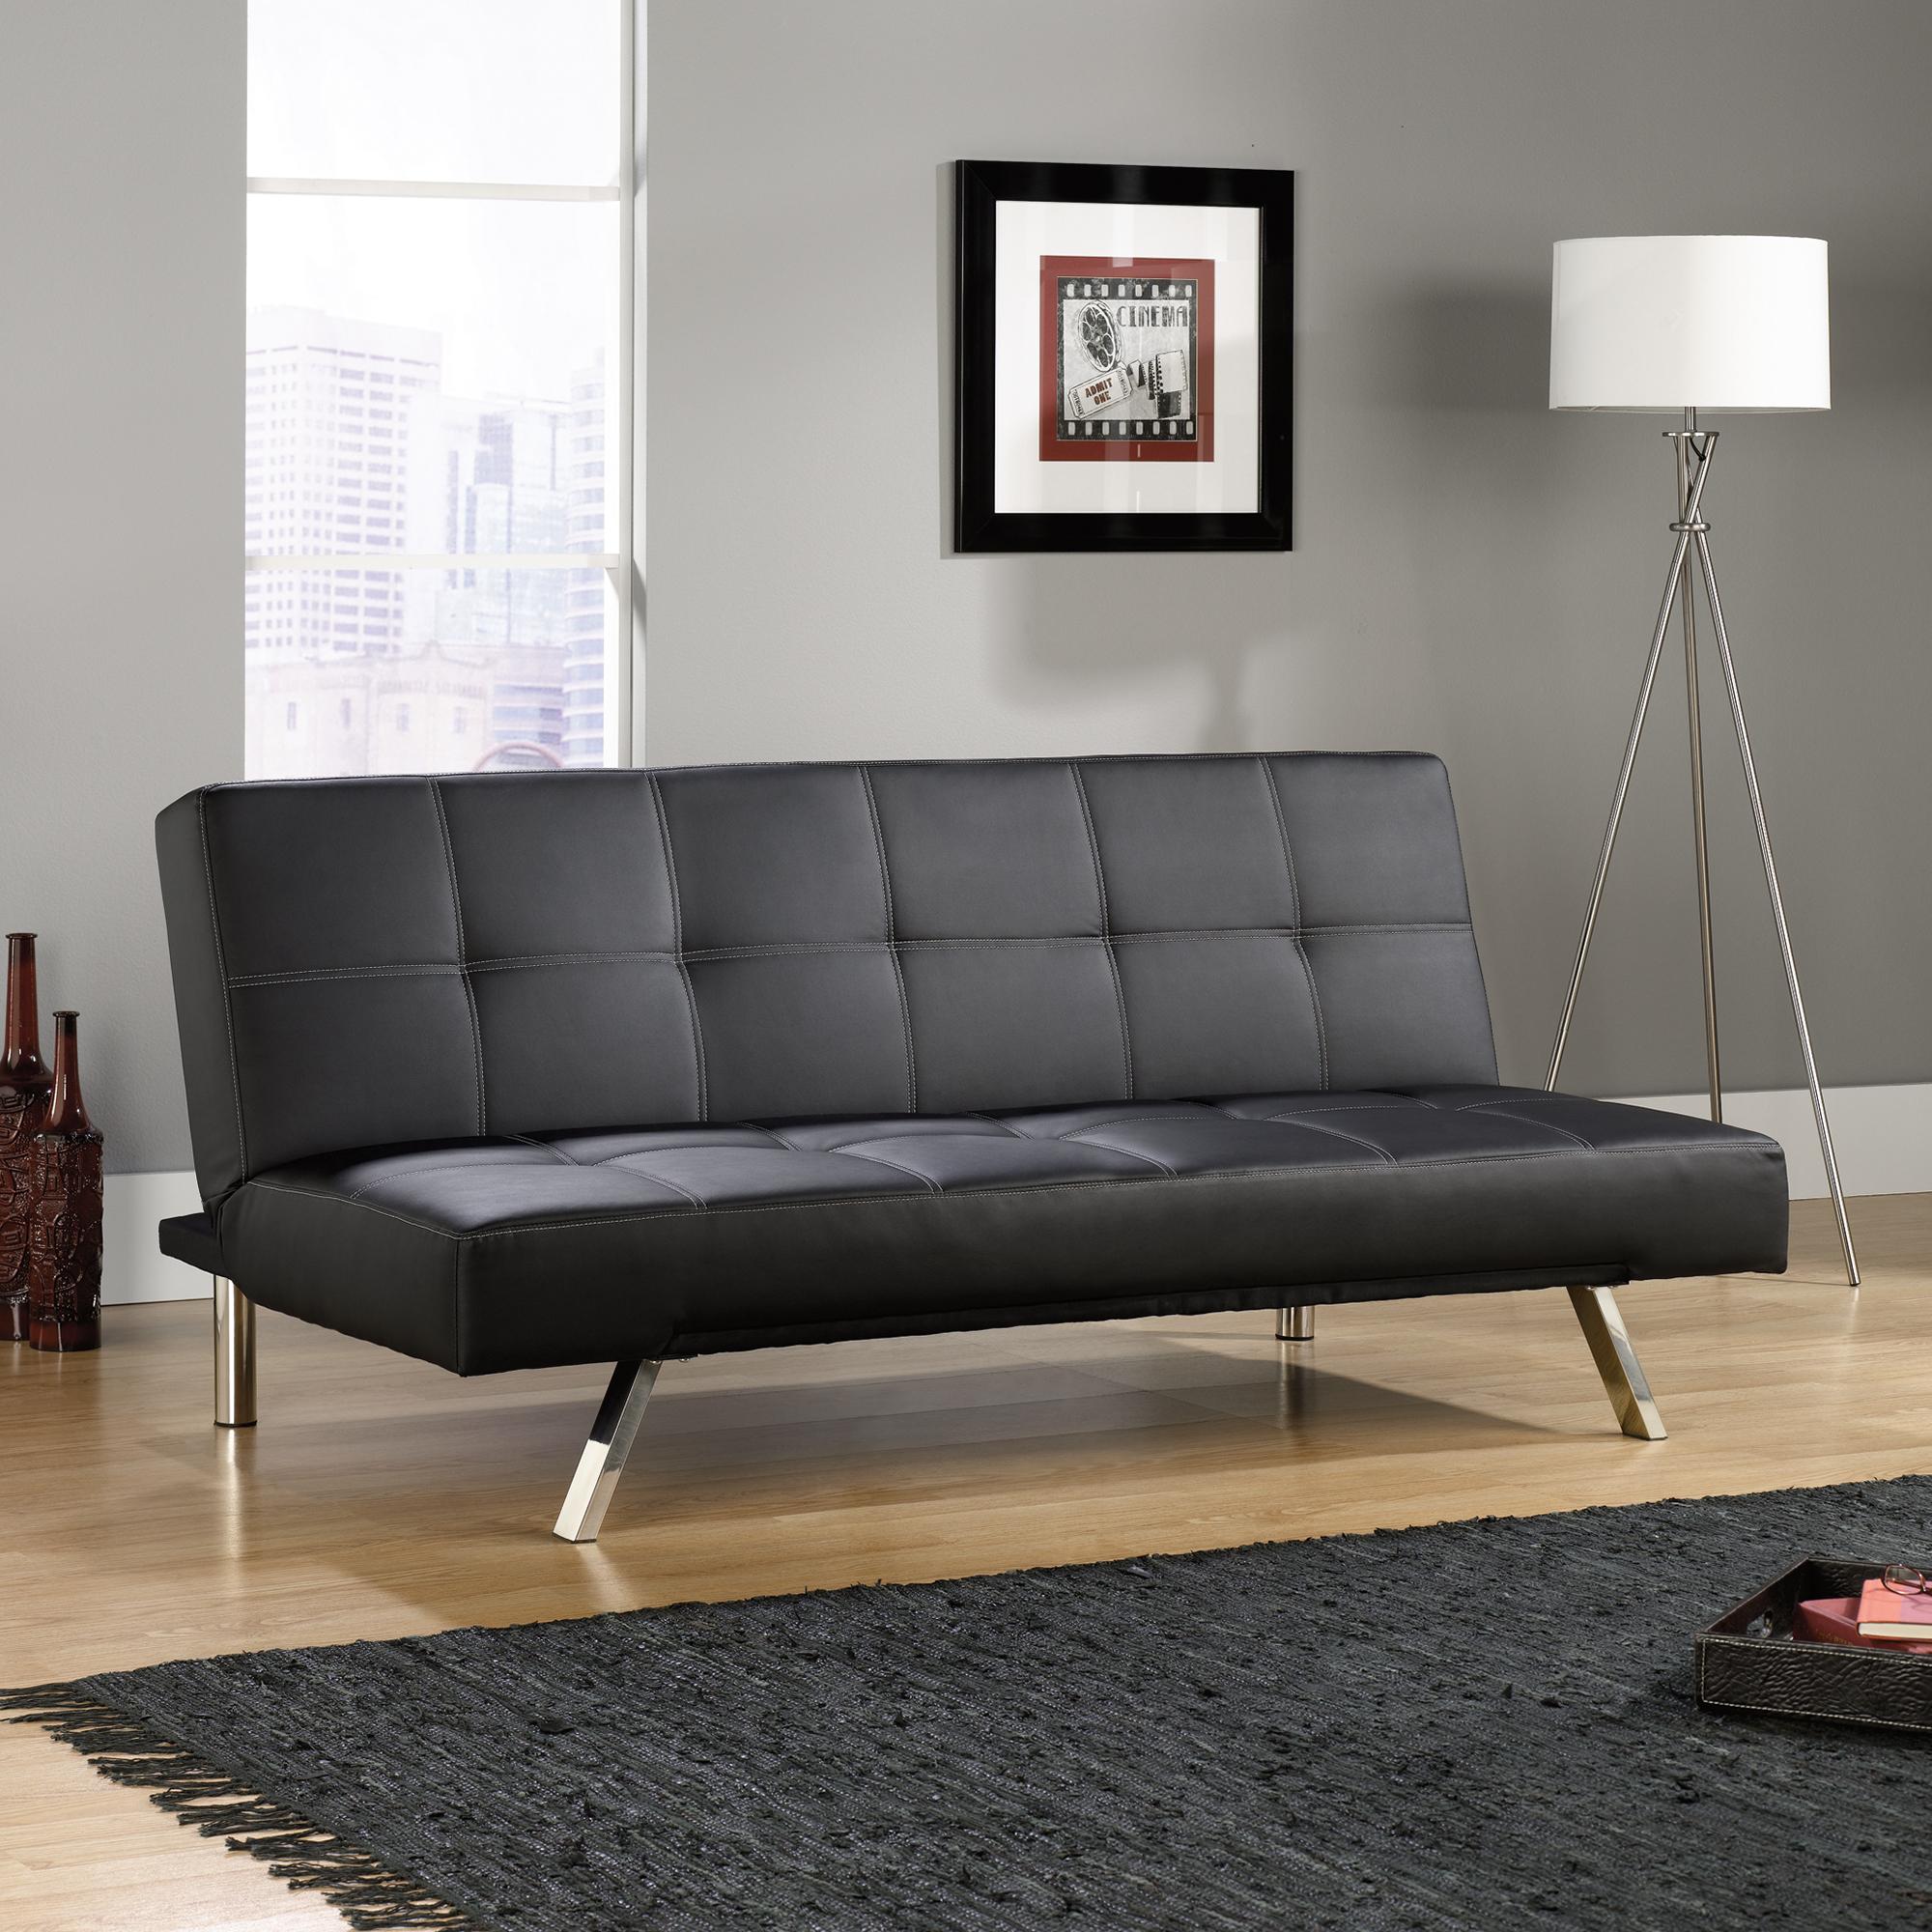 sauder cooper sofa convertible 413193 sauder the furniture co. Black Bedroom Furniture Sets. Home Design Ideas